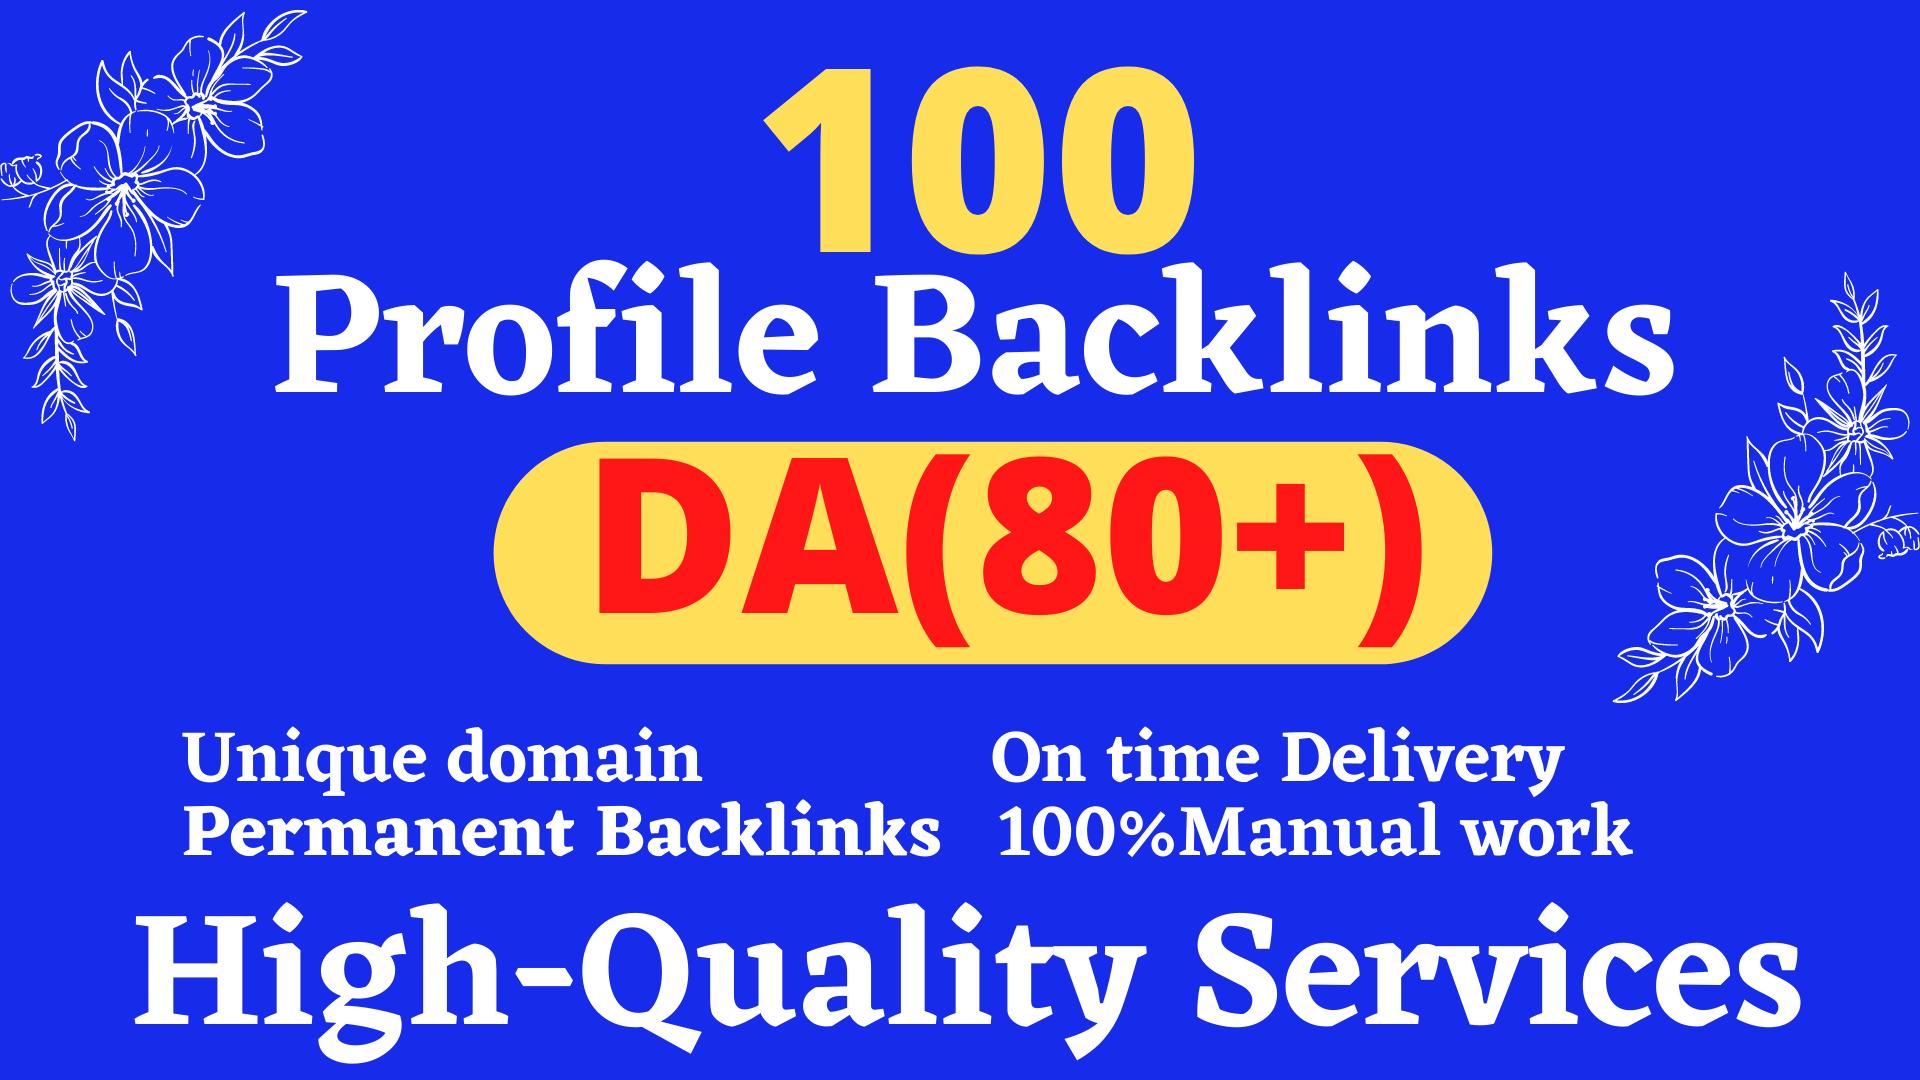 Manually create 100 TOP BRAND 80+DA Profile Backlinks